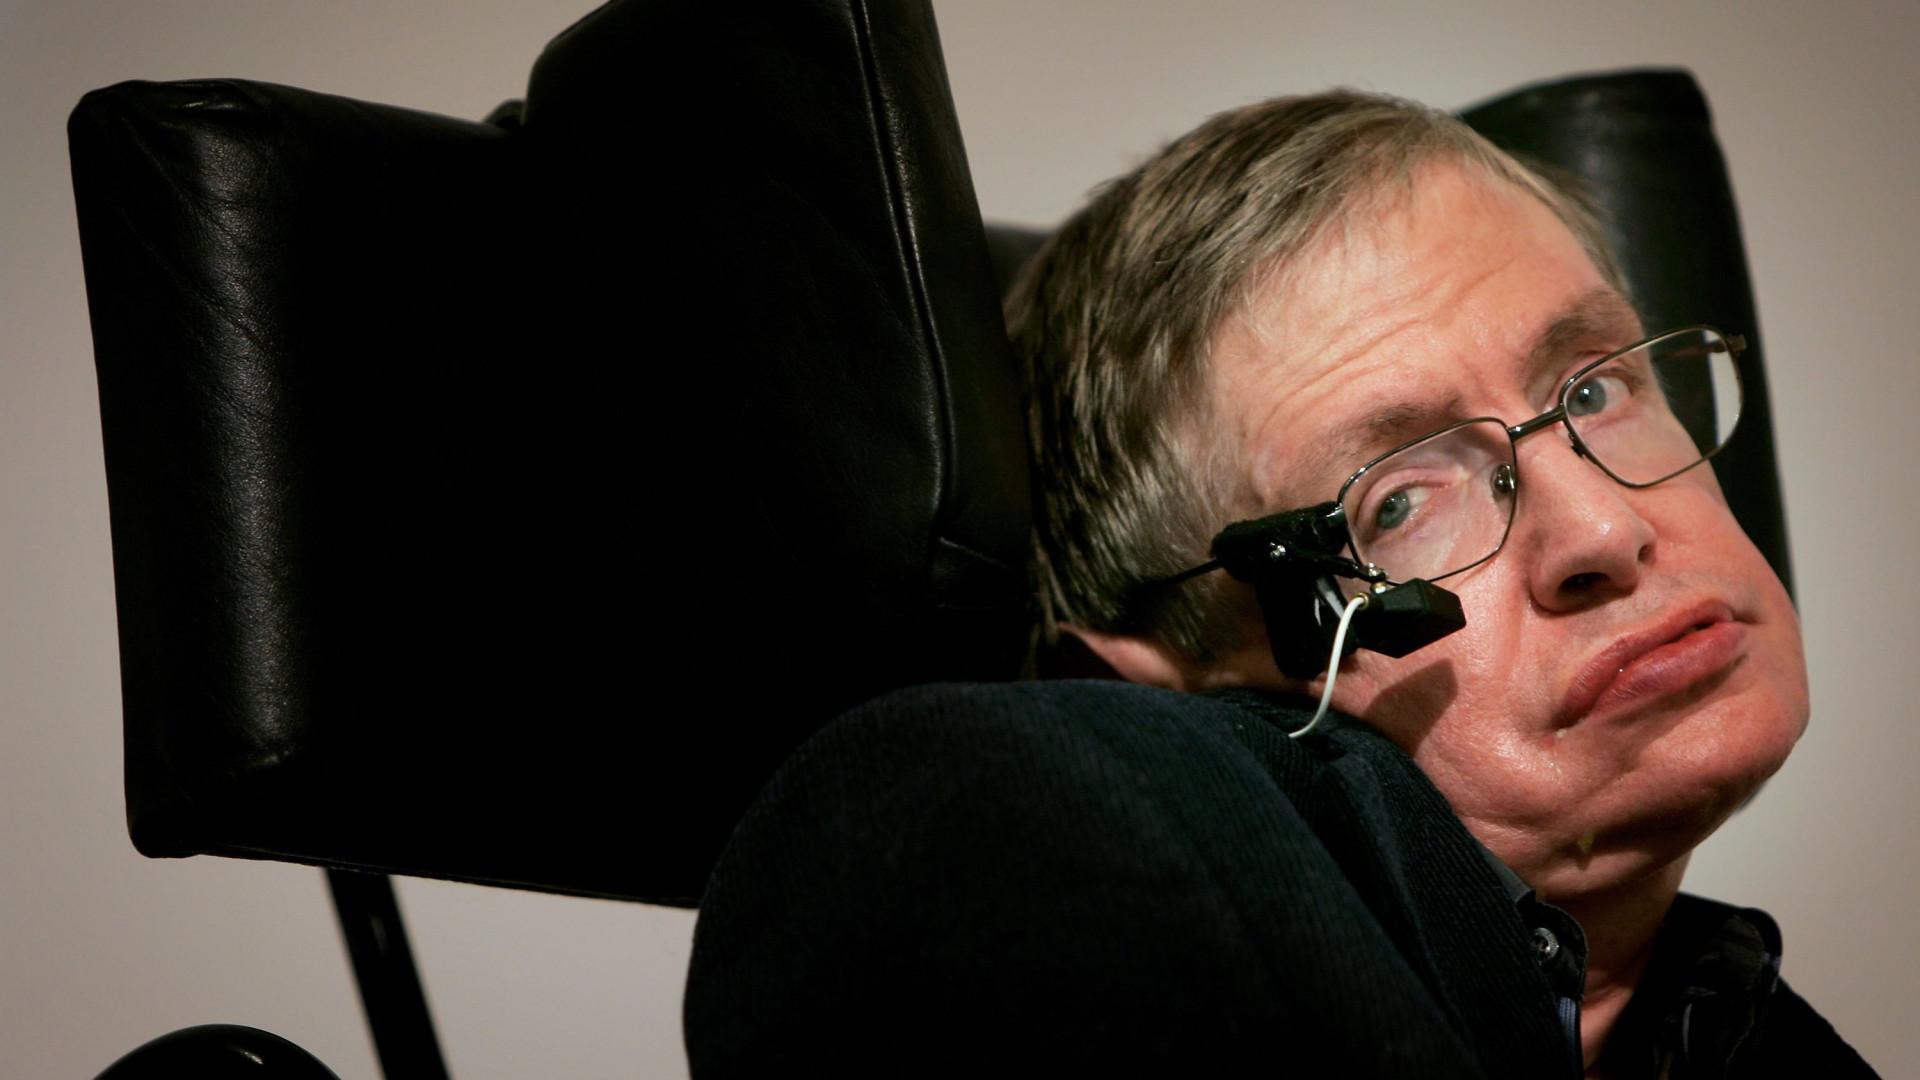 Amigos, familiares e público se juntam em funeral de Hawking